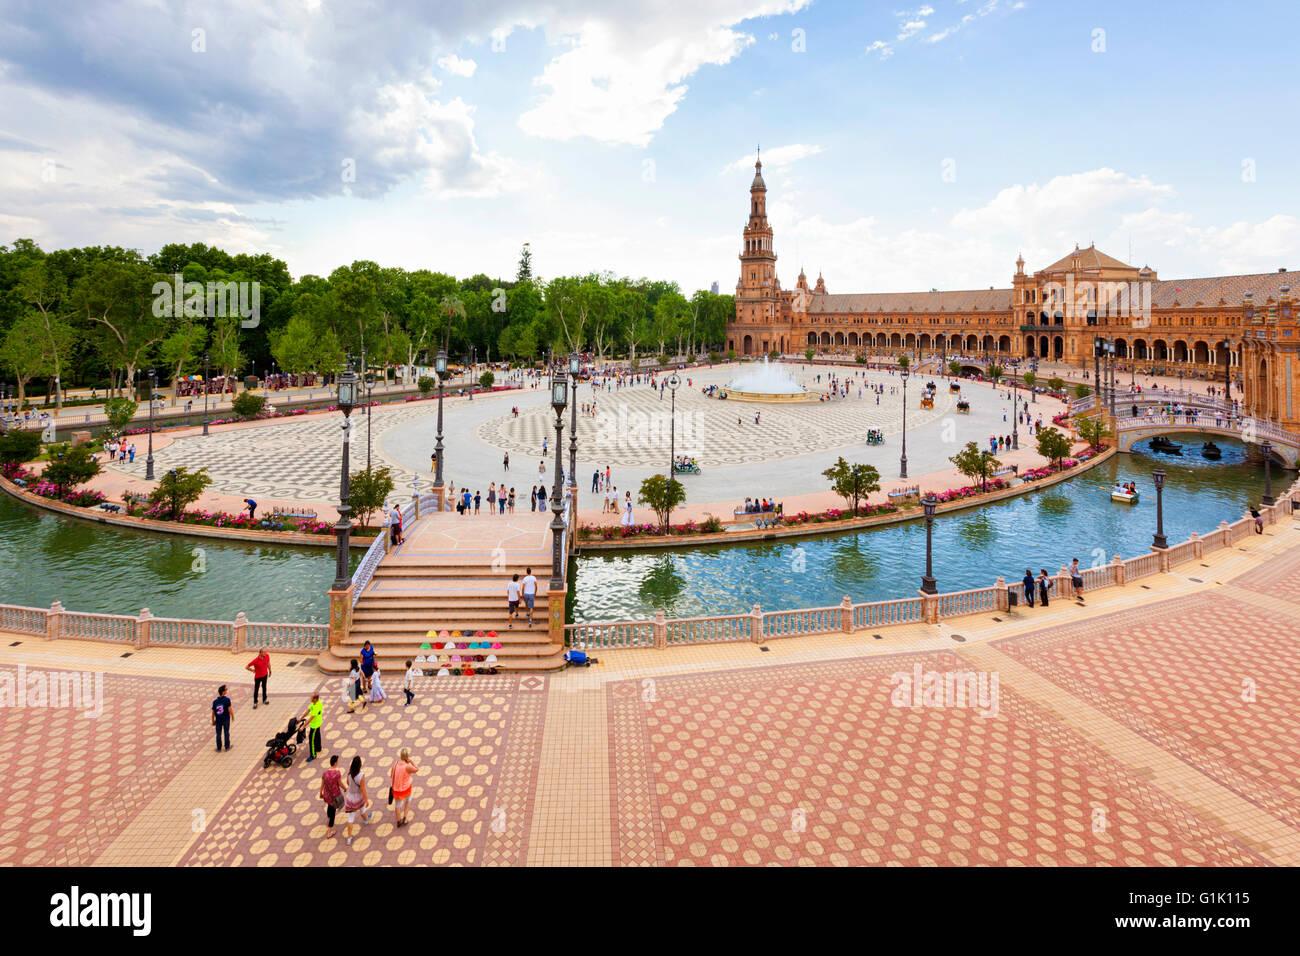 Vue grand angle de la Plaza de España, Séville, Espagne Photo Stock